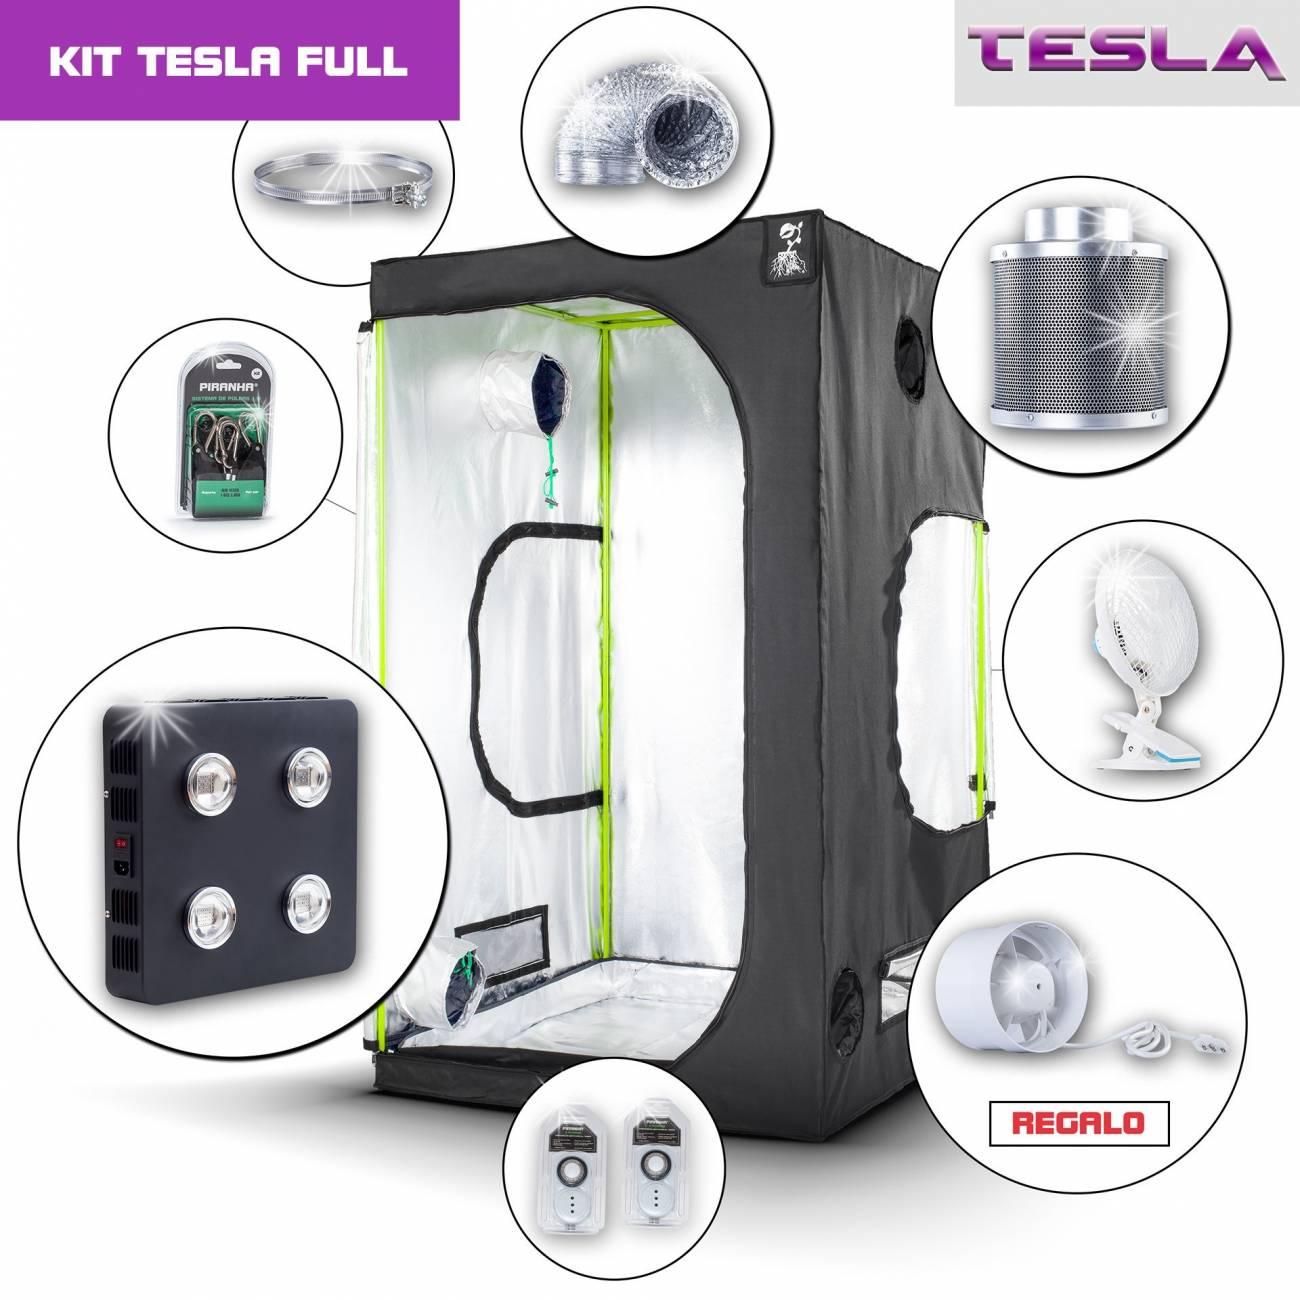 Kit Tesla 120 - T360W Completo